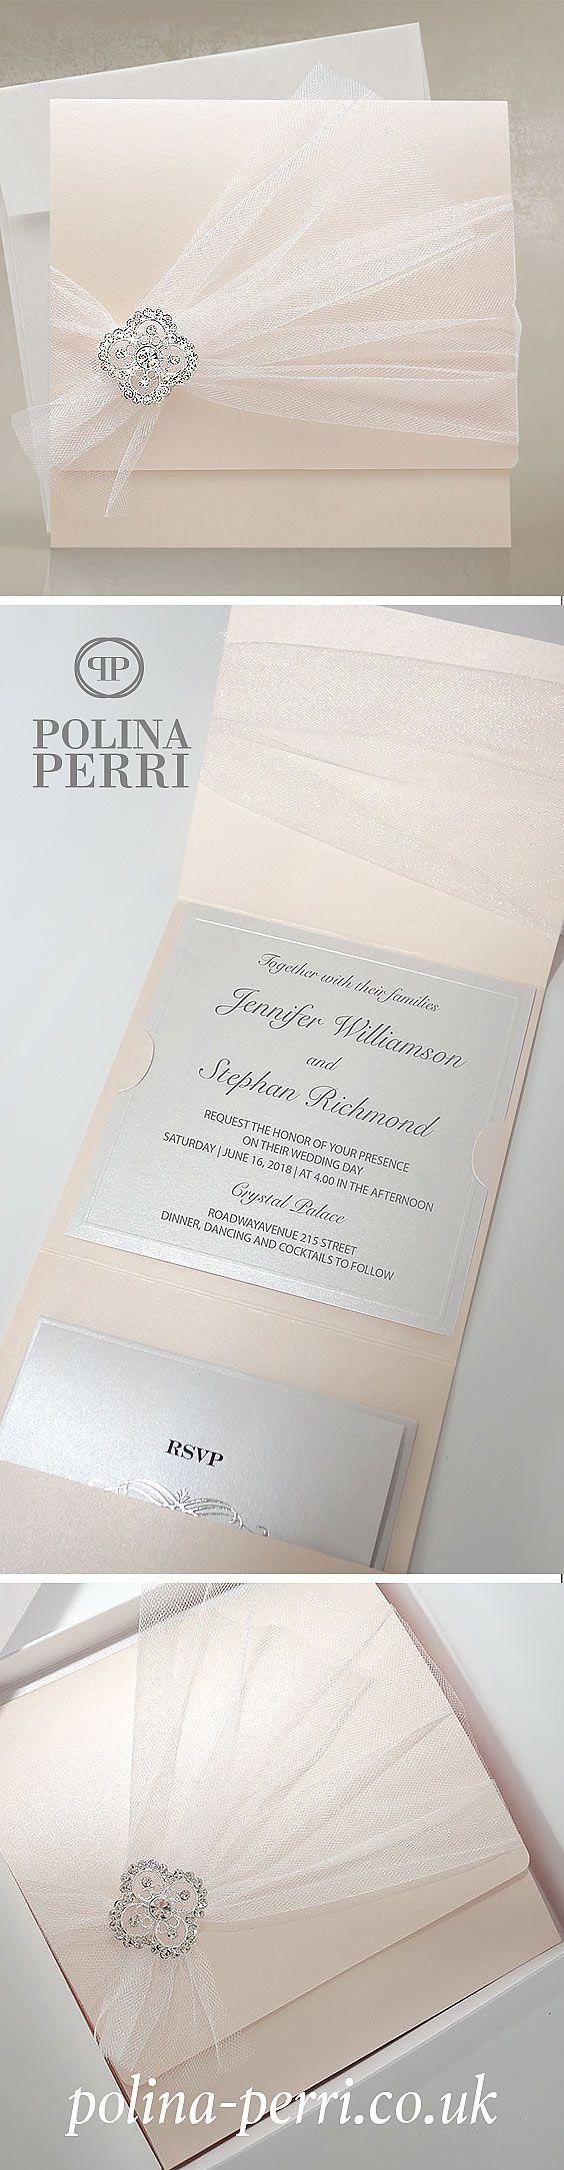 1862 best invitaciones images on Pinterest | Bridal invitations ...